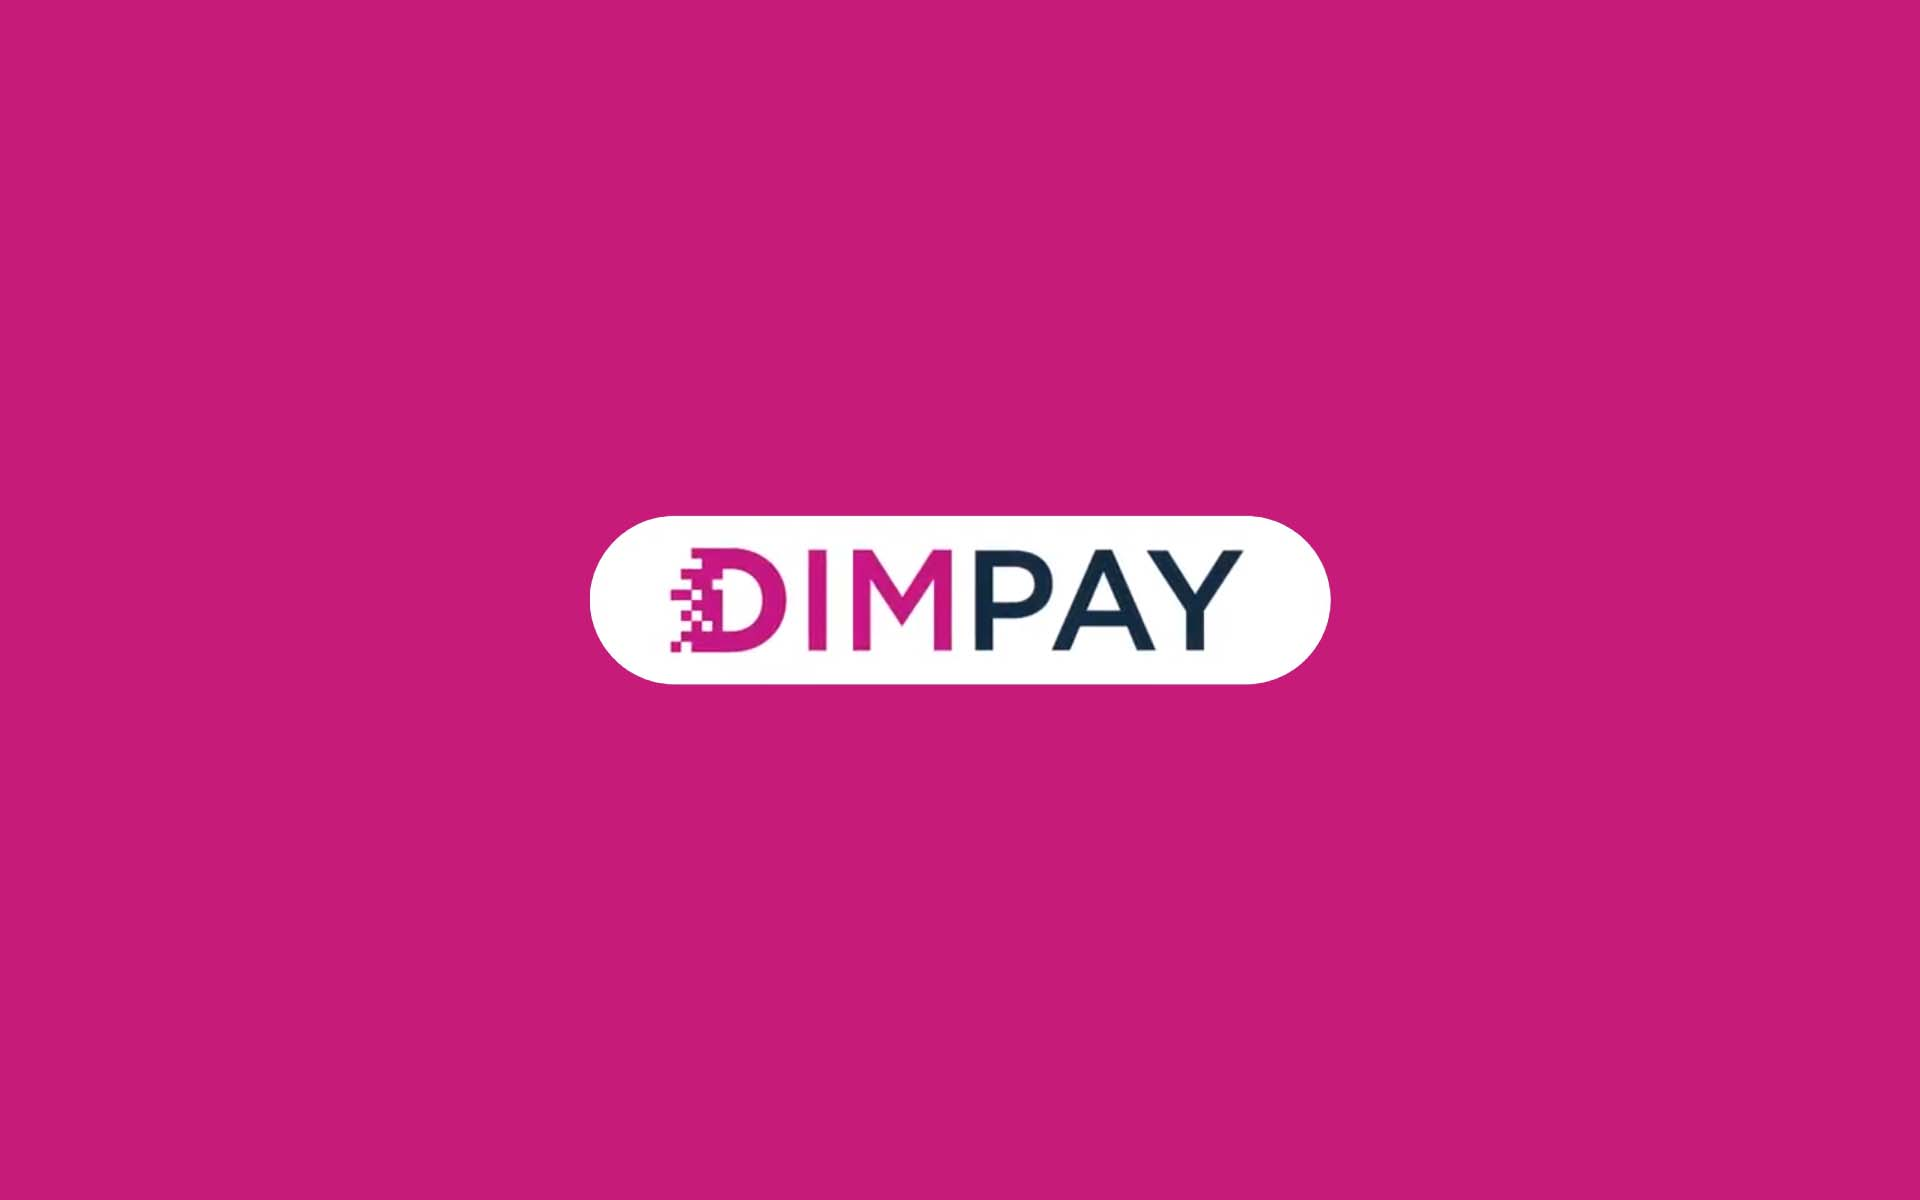 DIMPAY - Cashless Transaction Available Worldwide